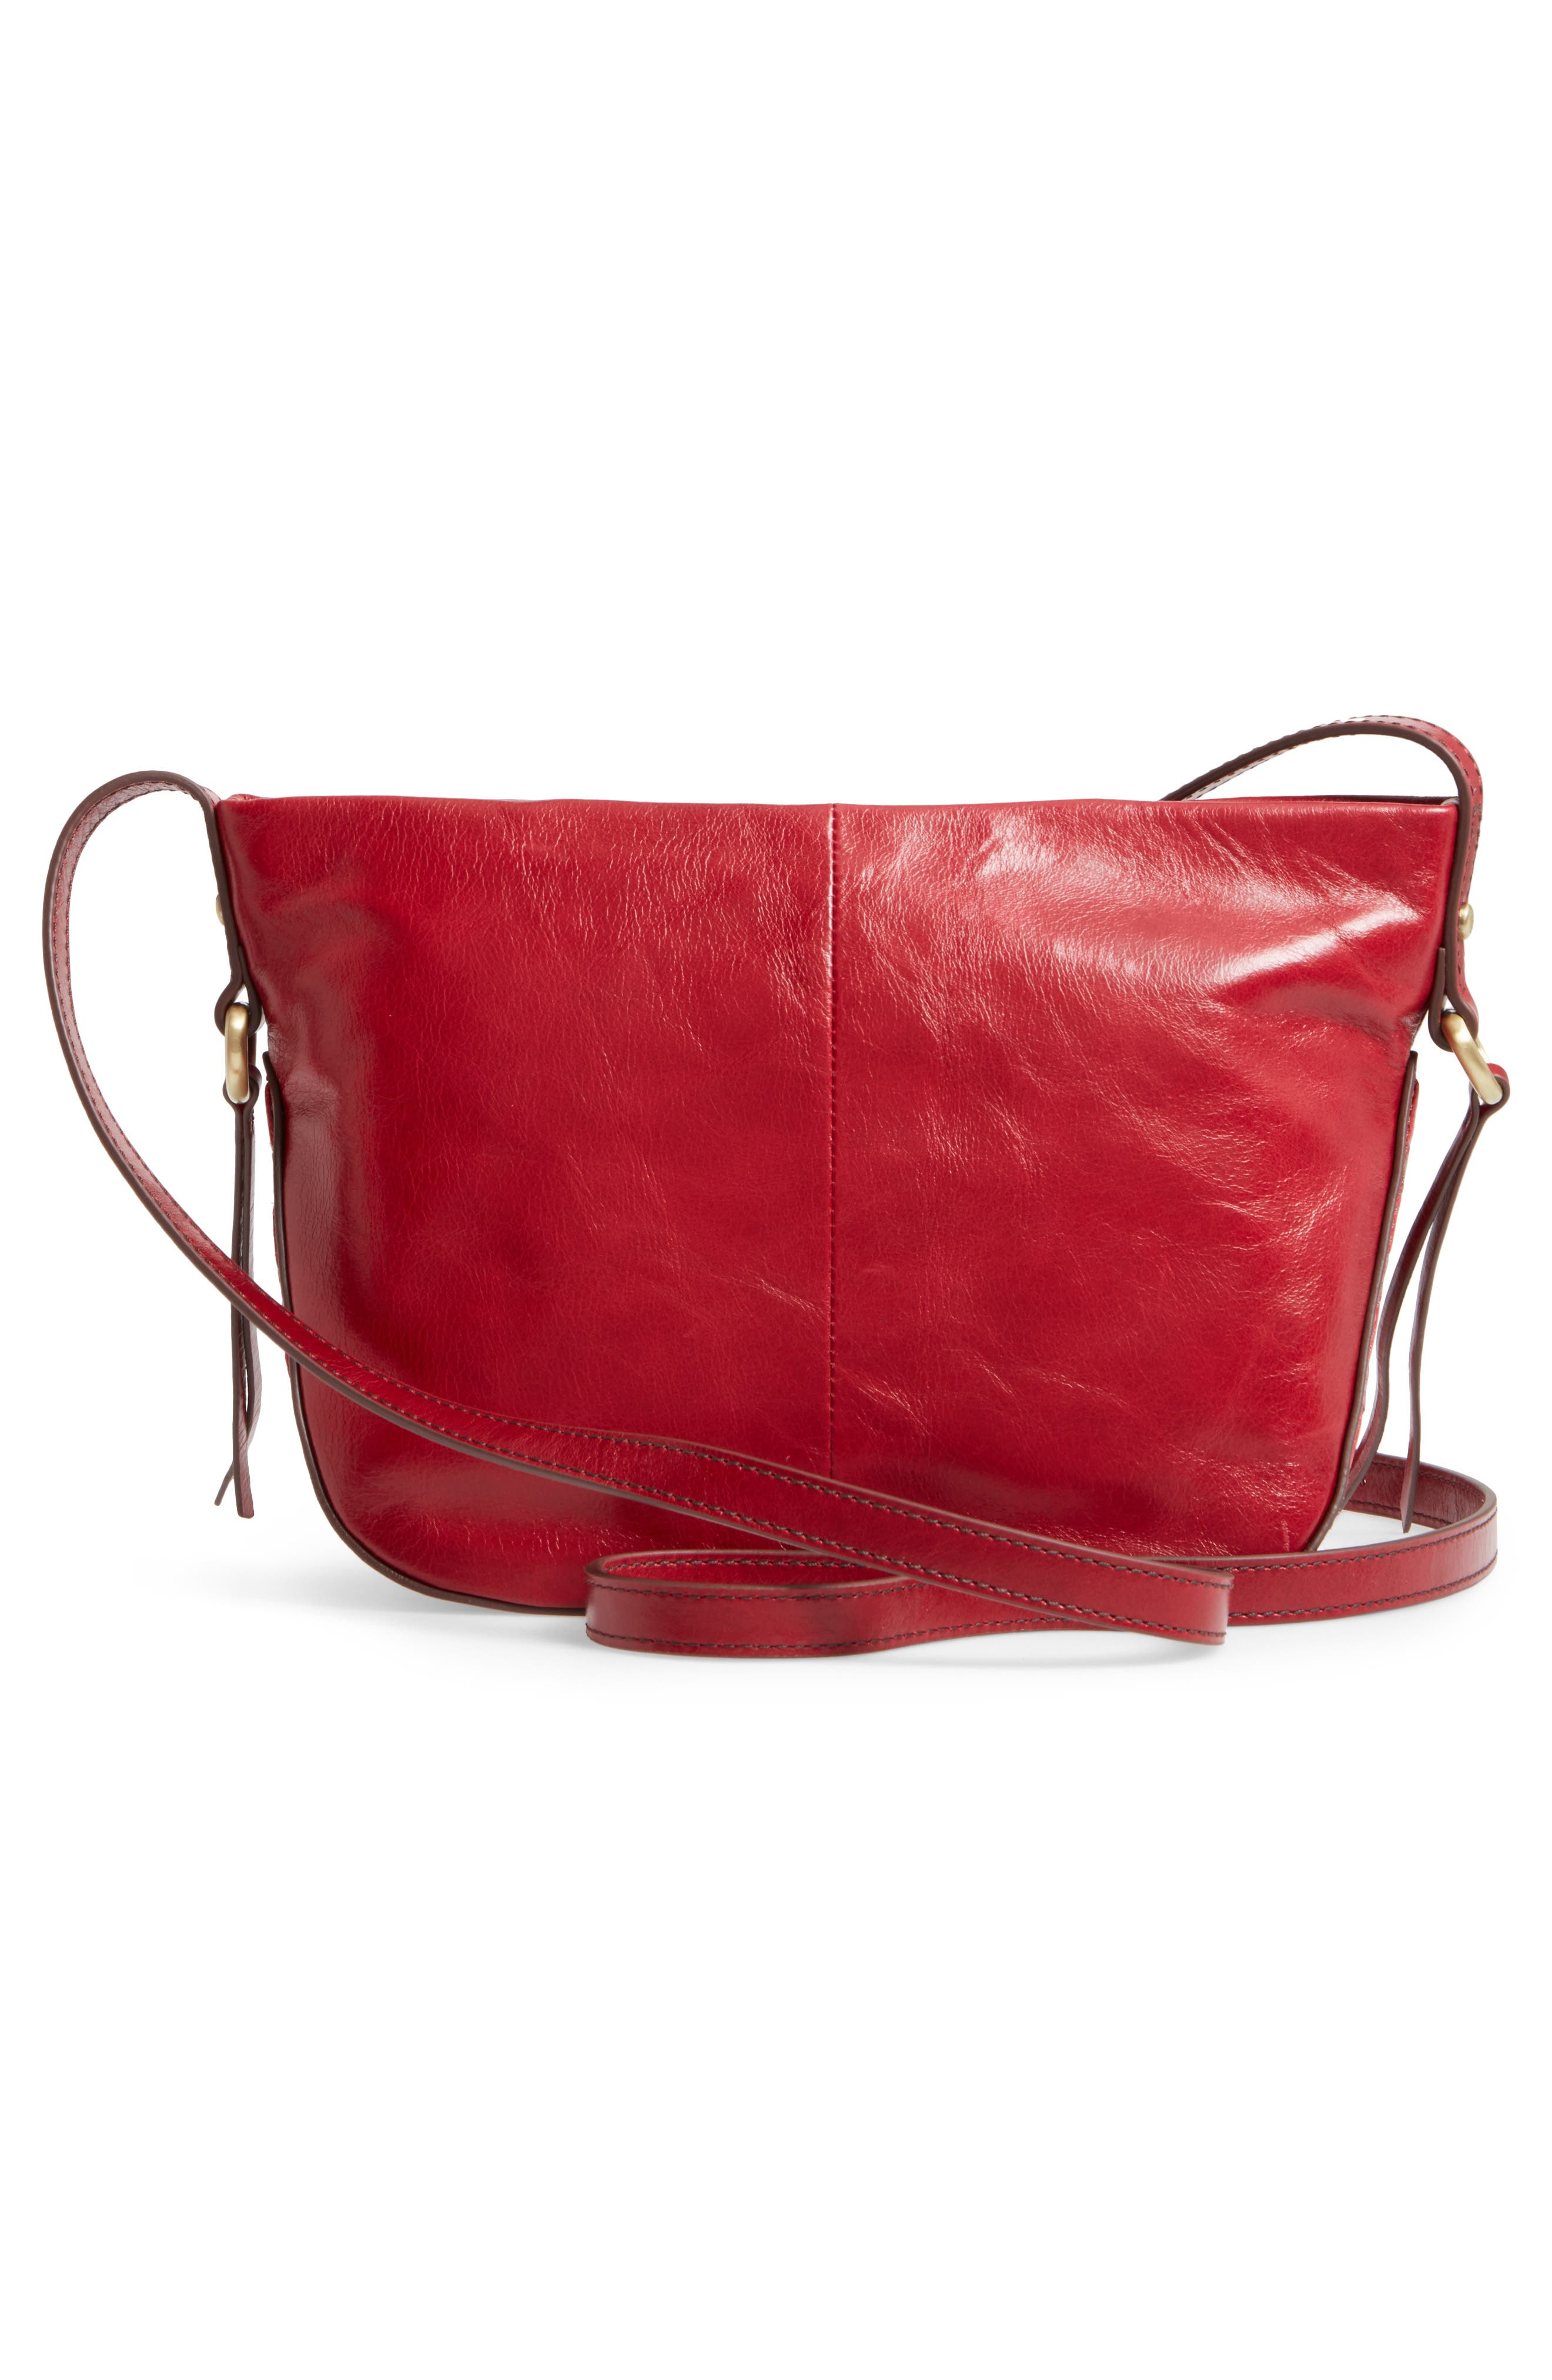 Muse Calfskin Leather Crossbody Bag,                             Alternate thumbnail 3, color,                             Cardinal